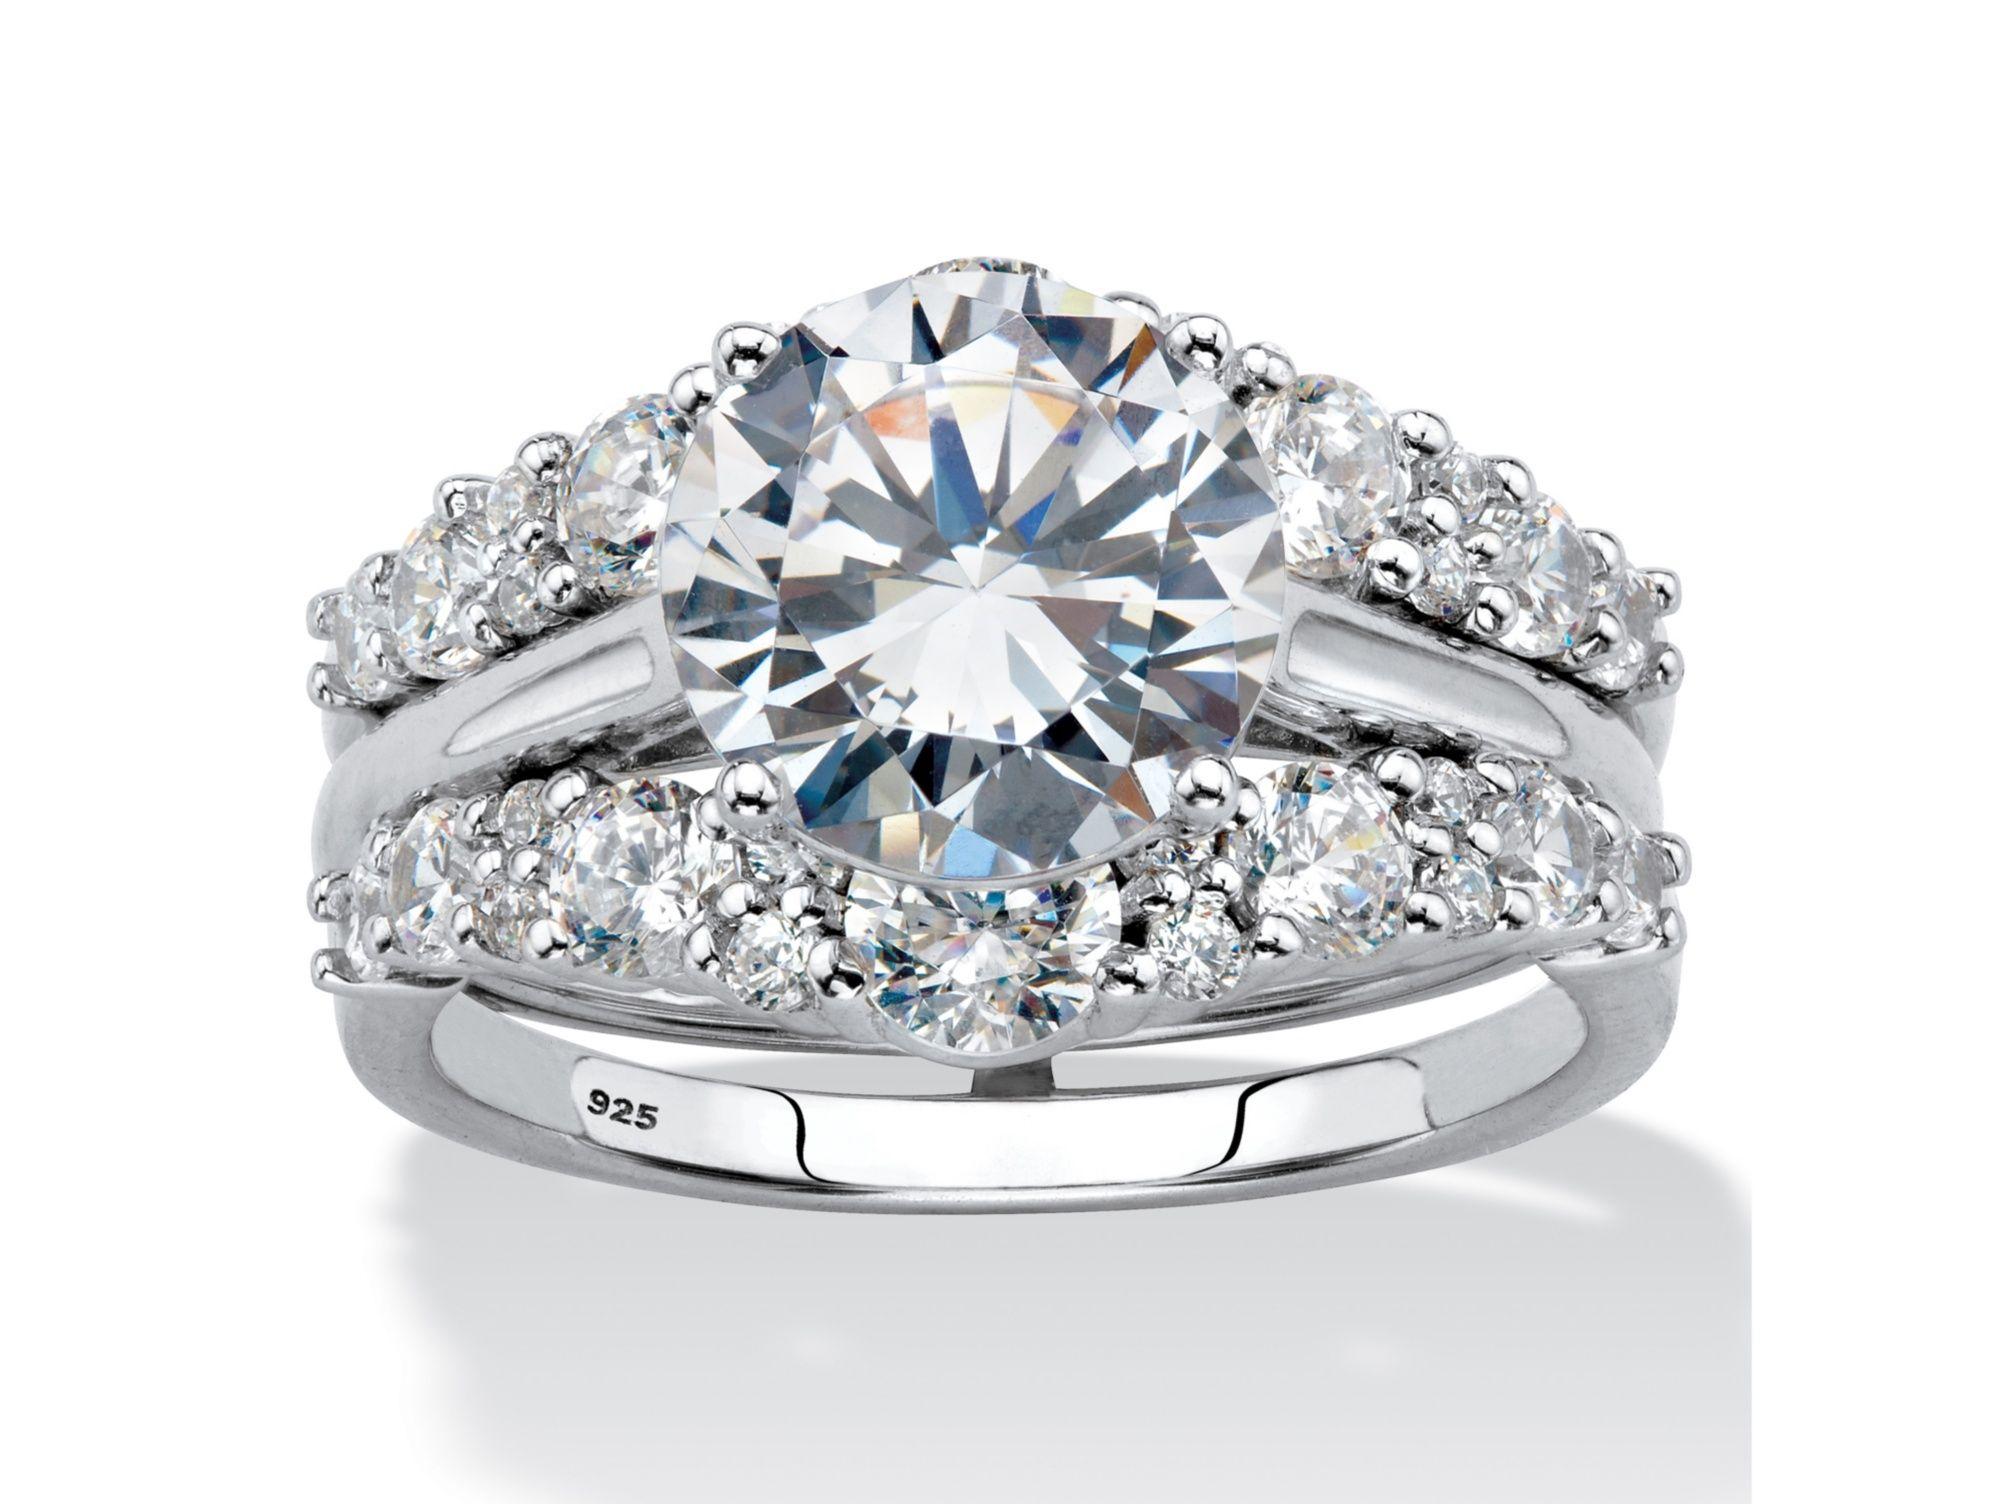 Jewelry Wedding ring sets, Wedding rings, Fashion rings